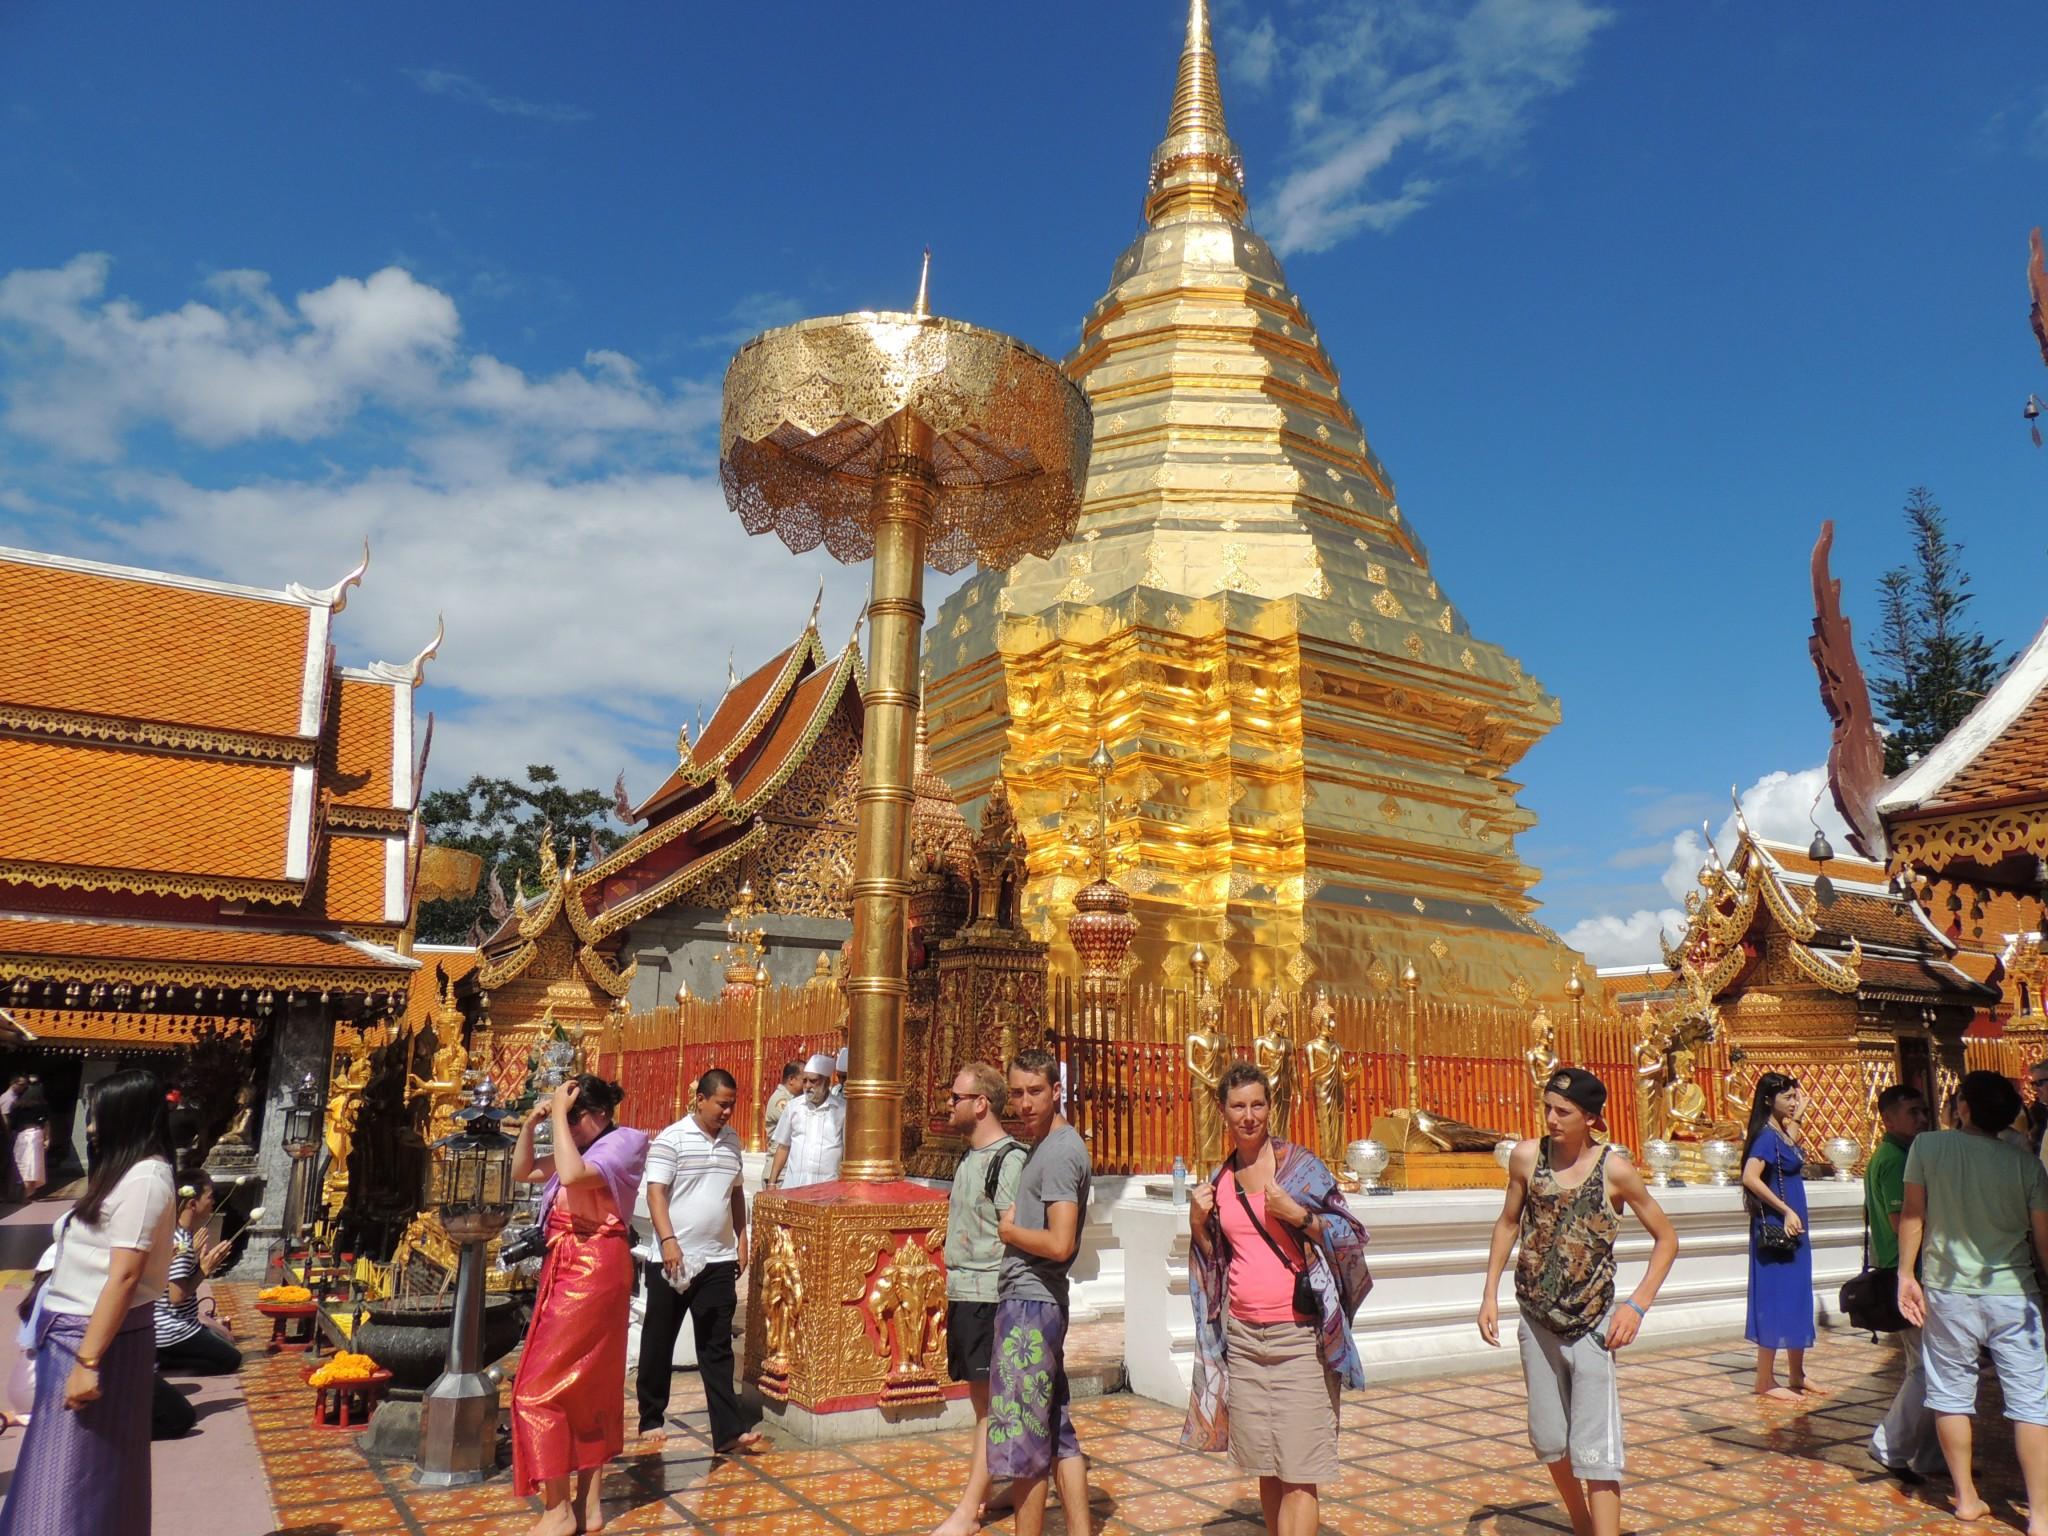 Thailand, Wat Phrathat Doi Suthep - Chaing Mai